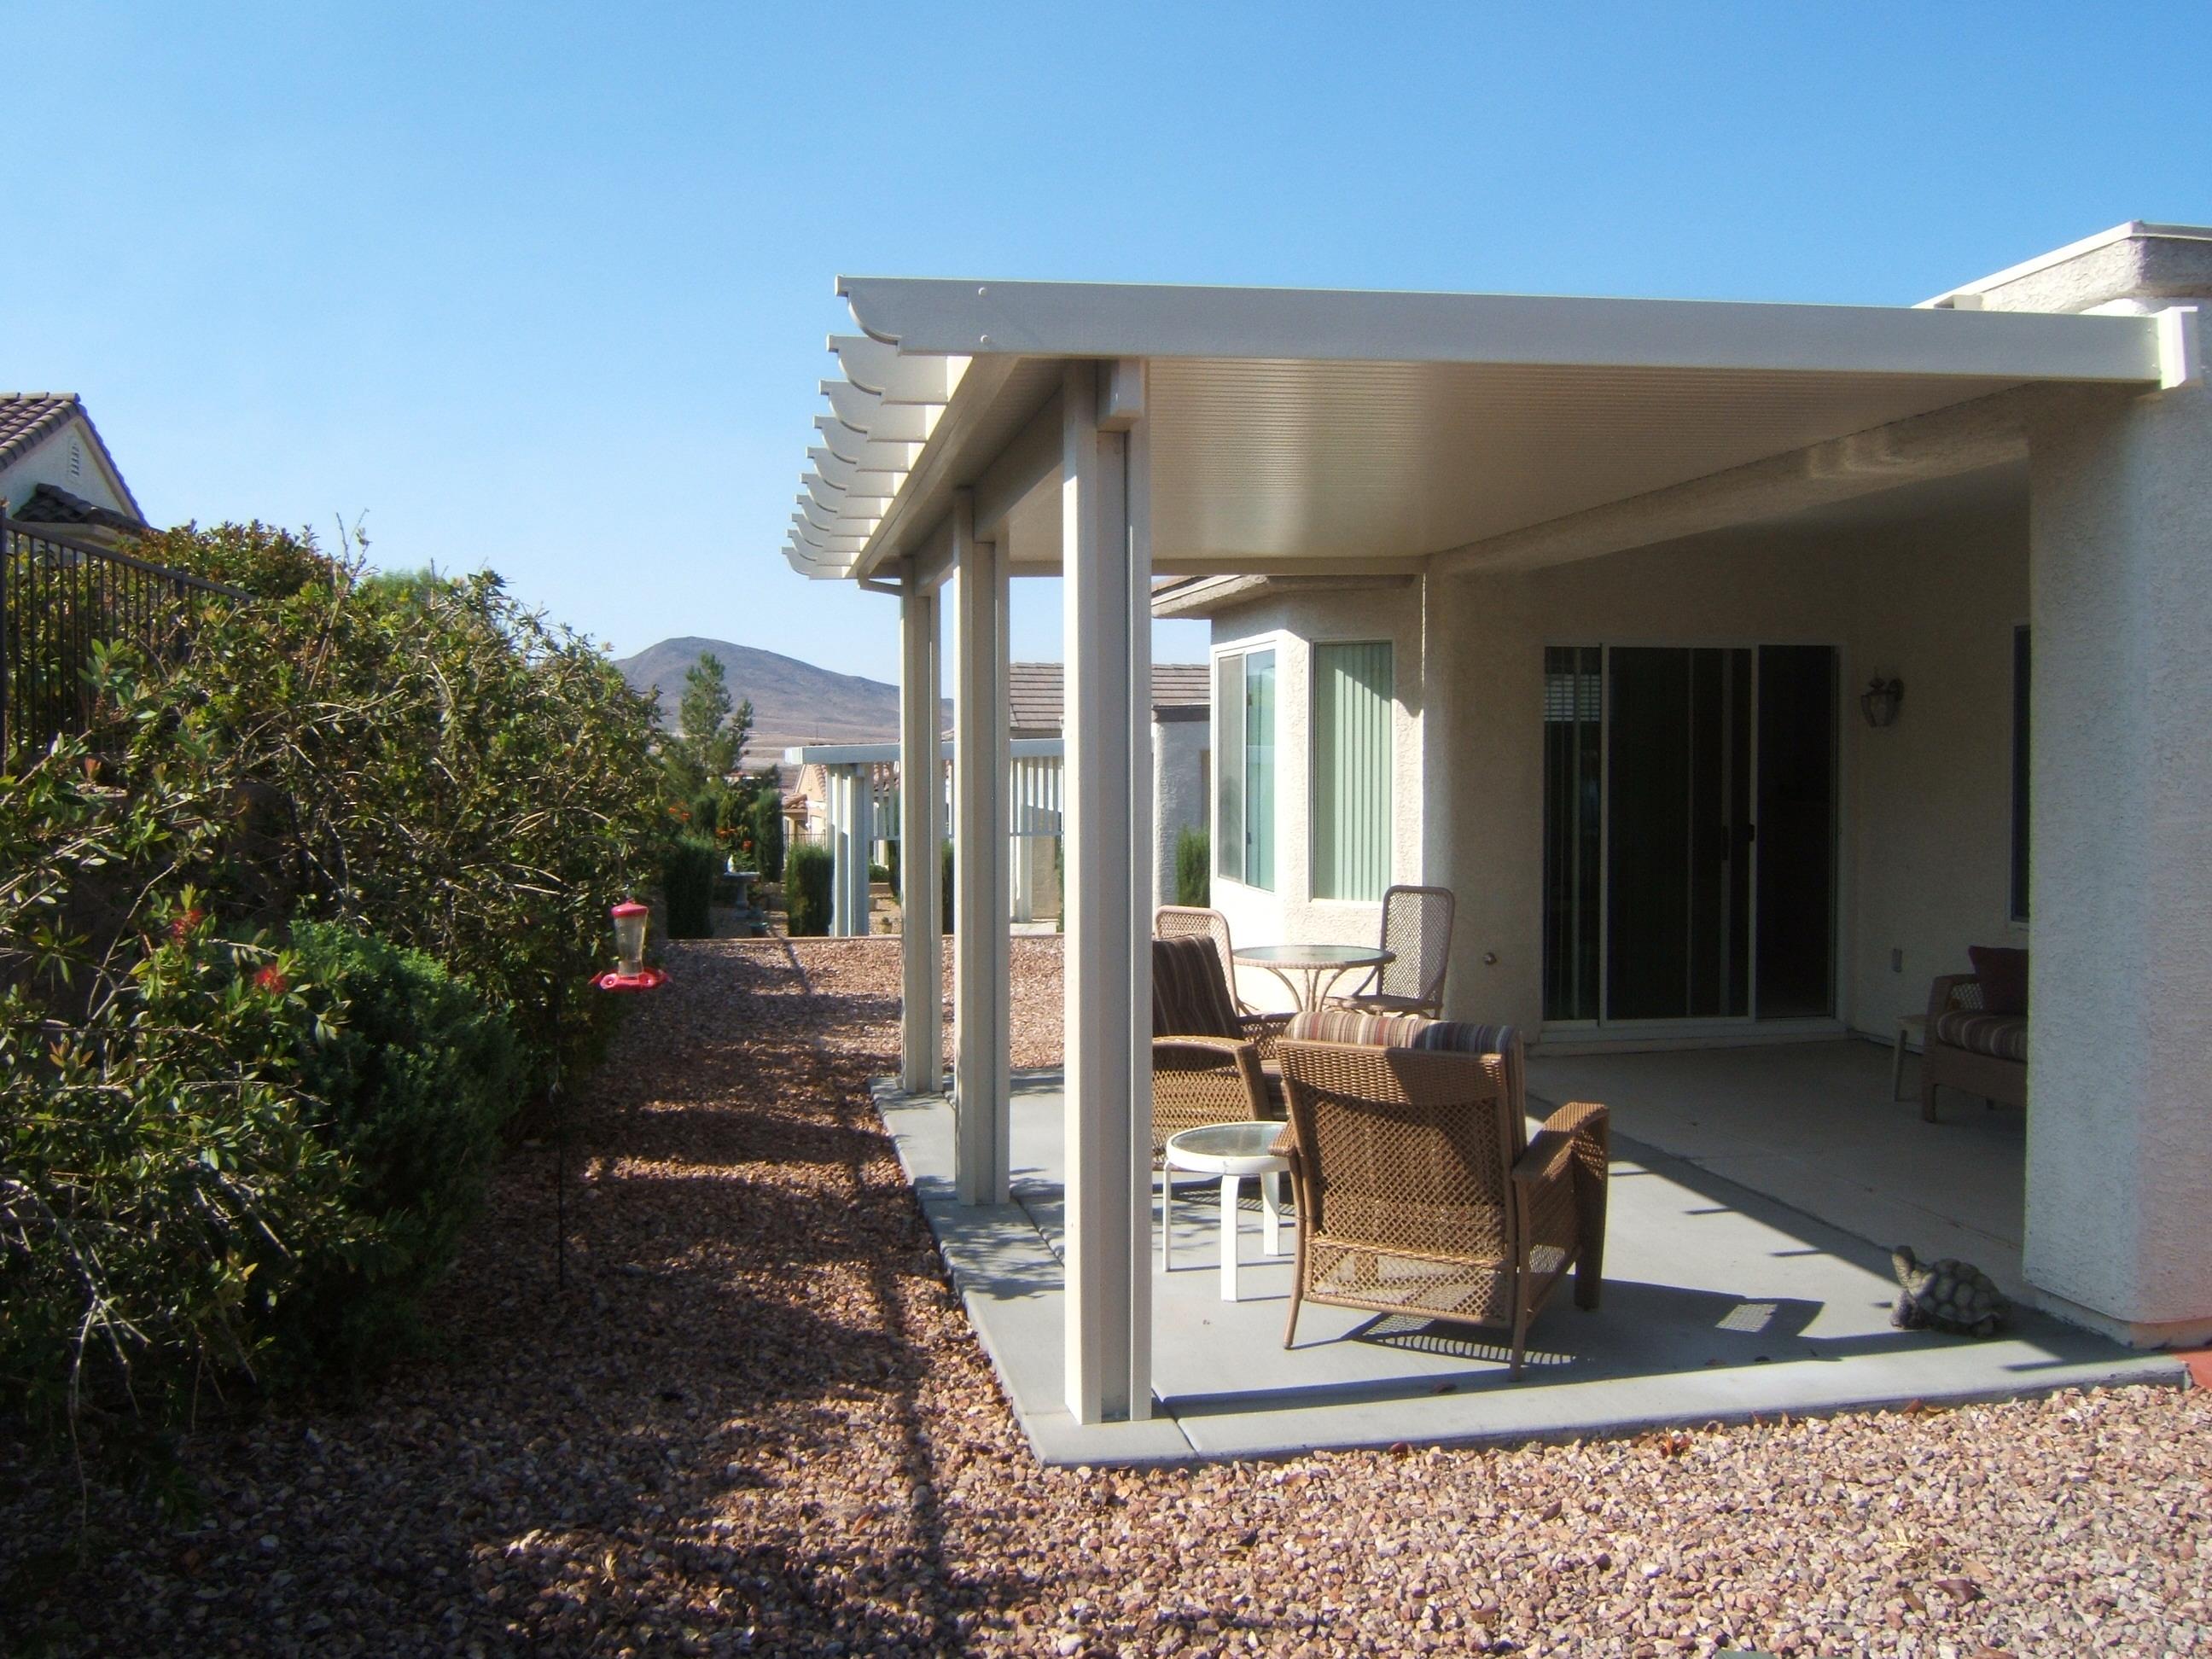 Ultra Patios: Las Vegas Patio Covers U0026 BBQ Islands Patio U0026 Deck Builders  Nevada